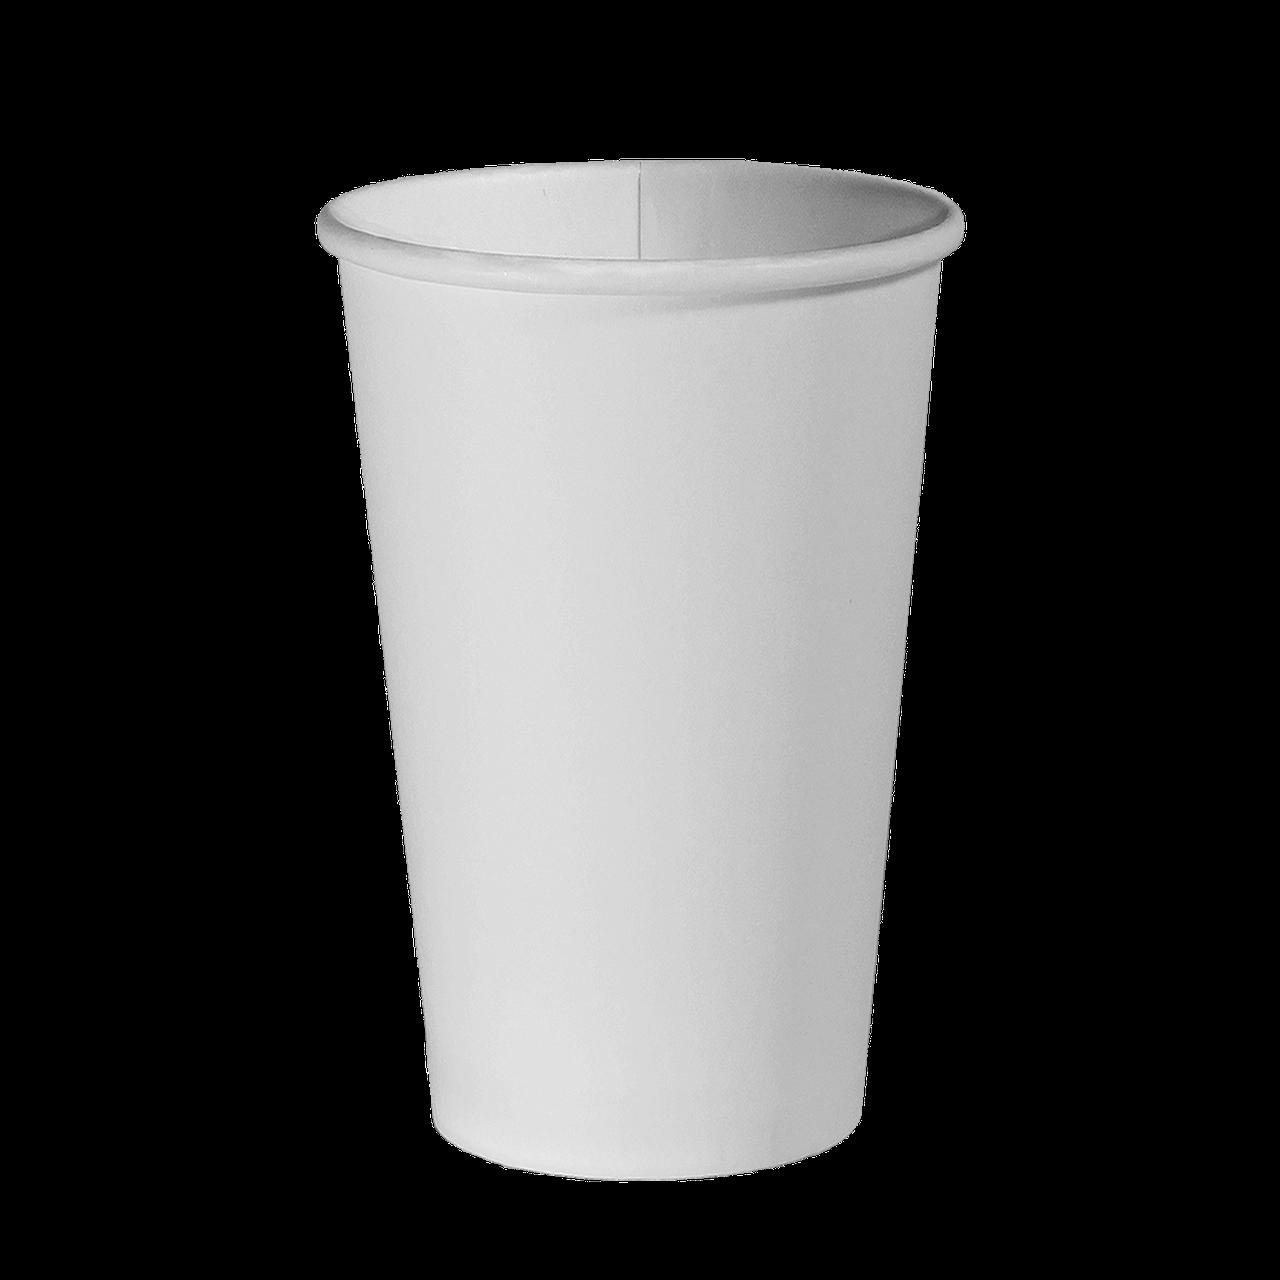 Стакан паперовий 500 мл. 50шт.уп. (20/700) Білий